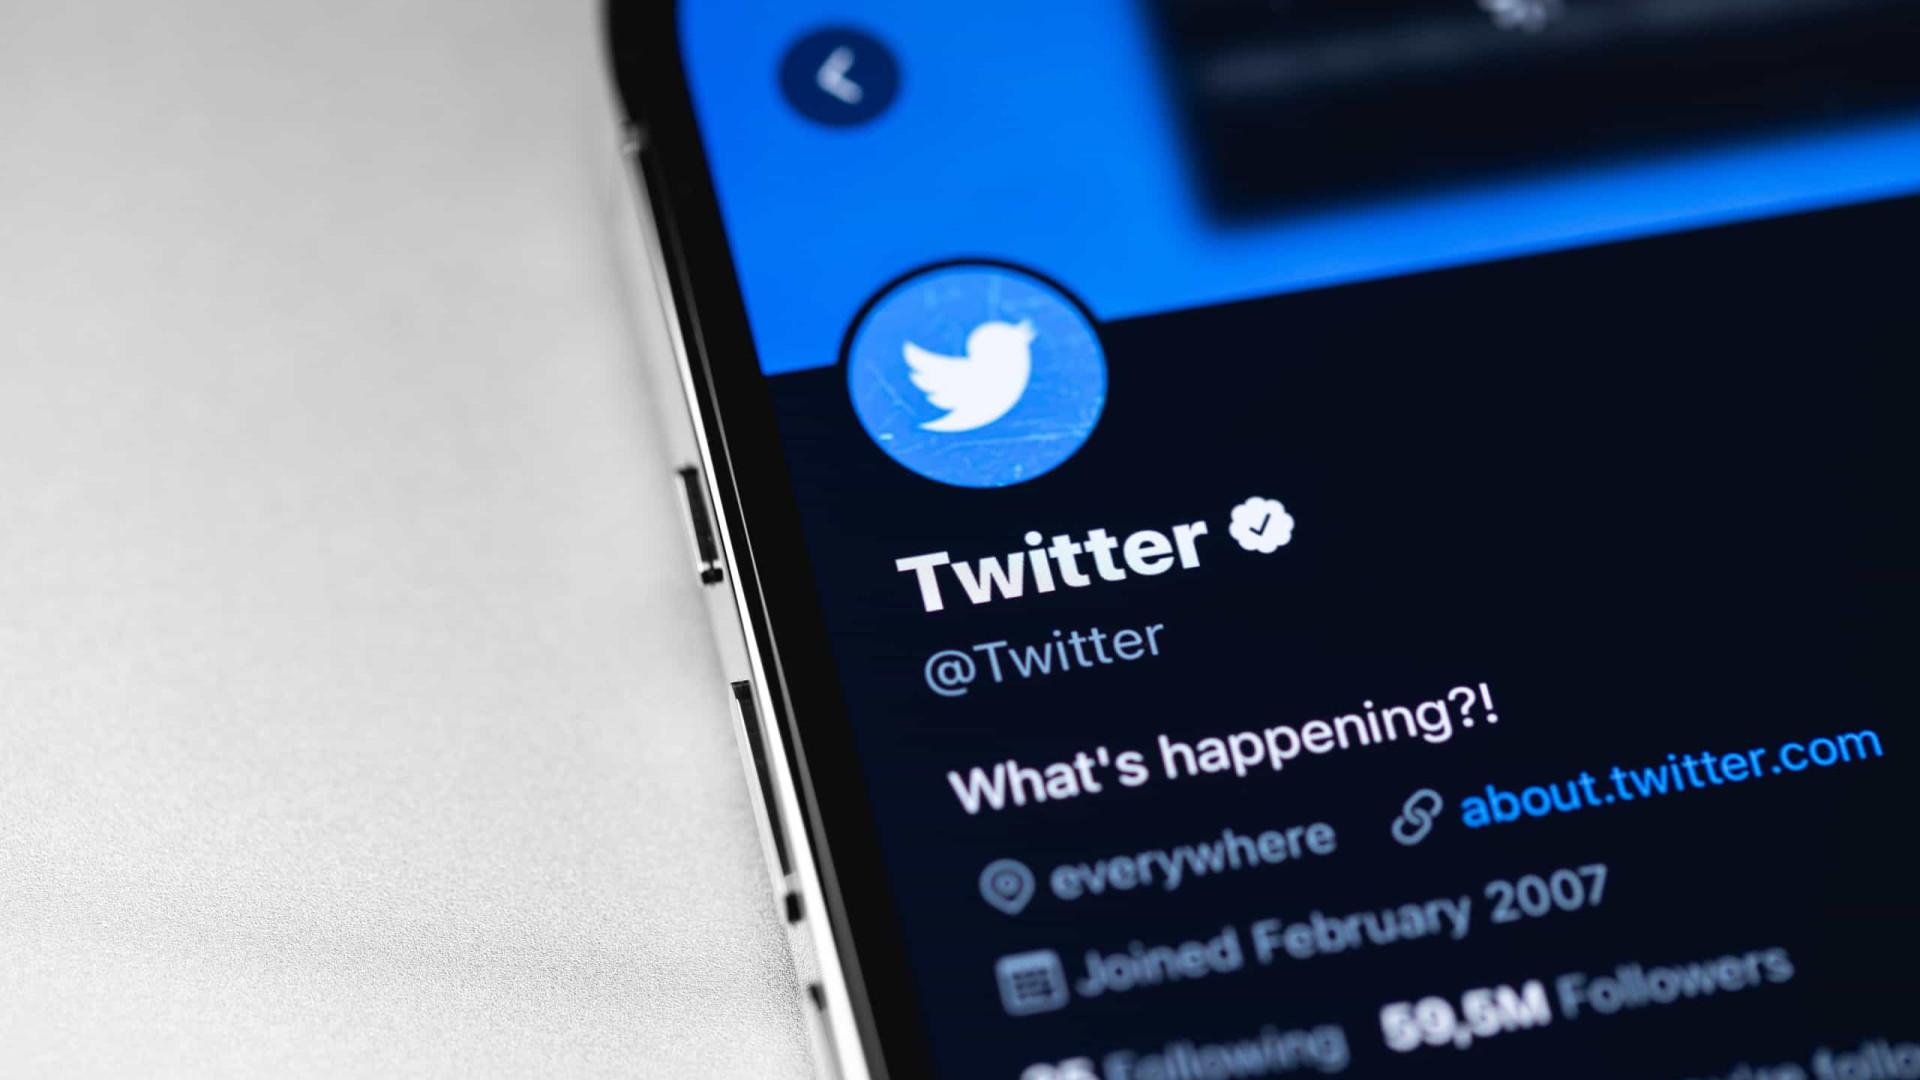 Twitter desabilita perfis suspeitos e bolsonaristas reclamam